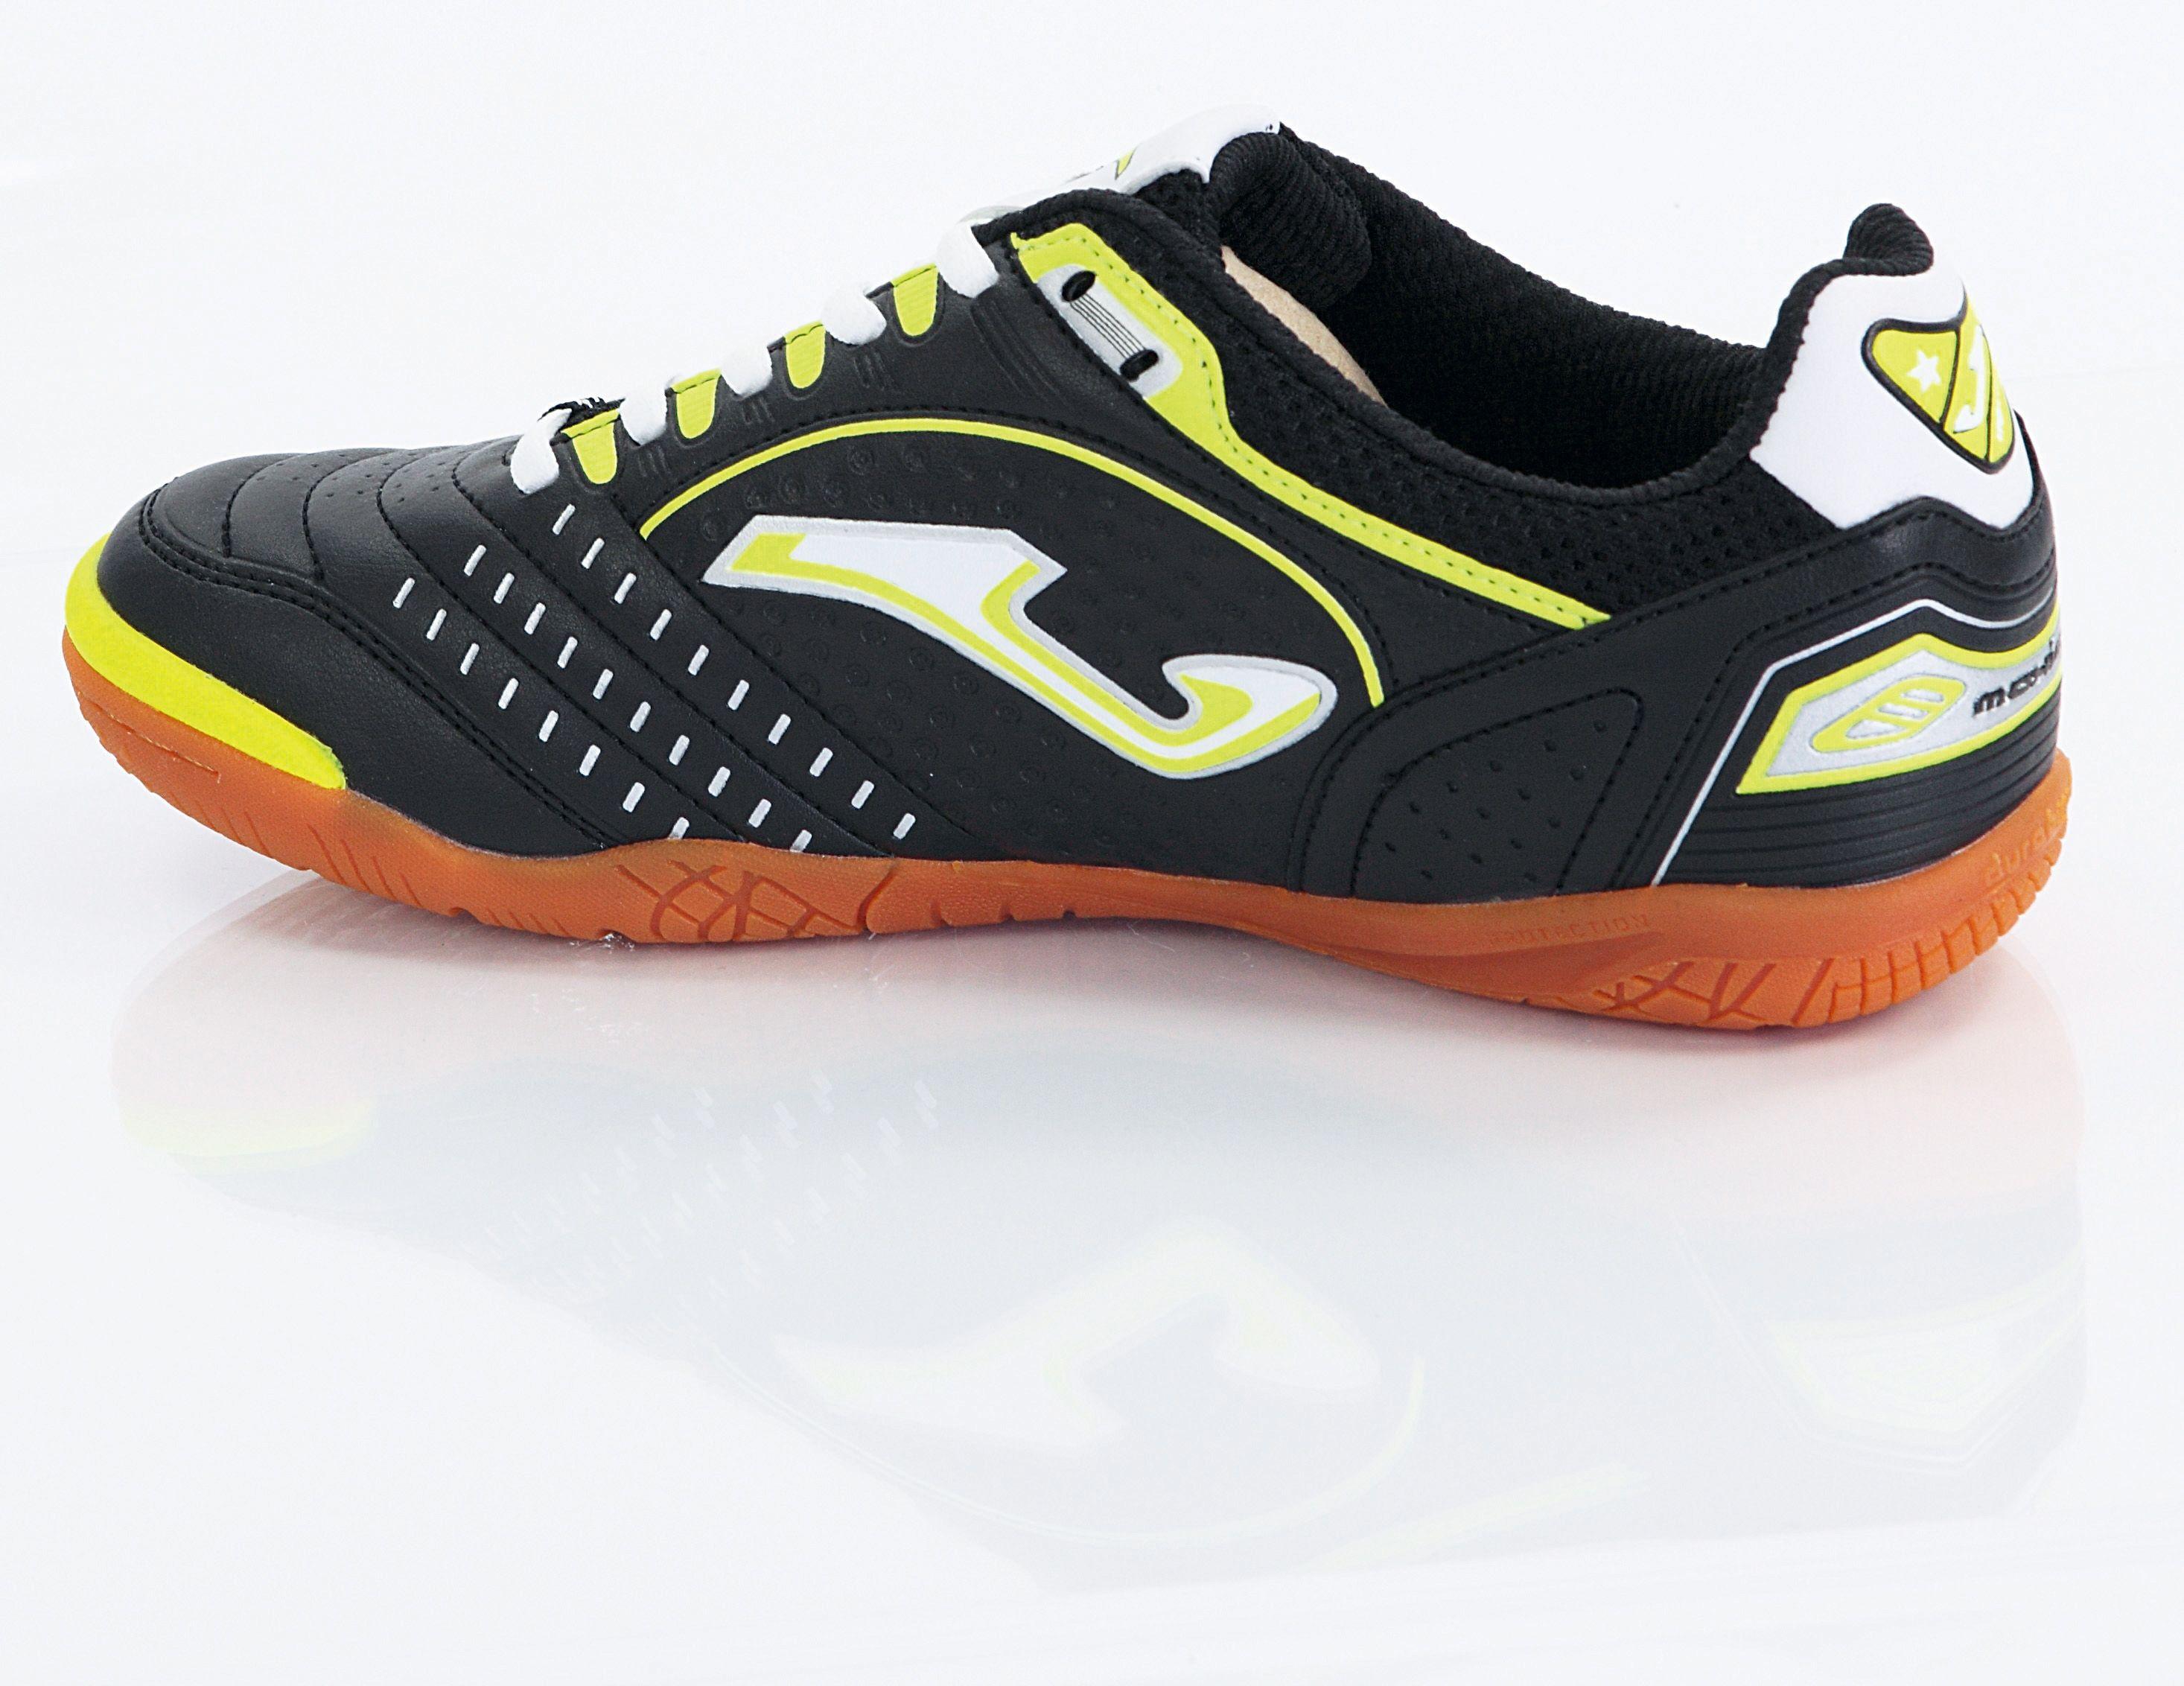 Joma Maxima Ftbol Sala Pinterest Sepatu Futsal Mizuno Classic 2 In Yellow